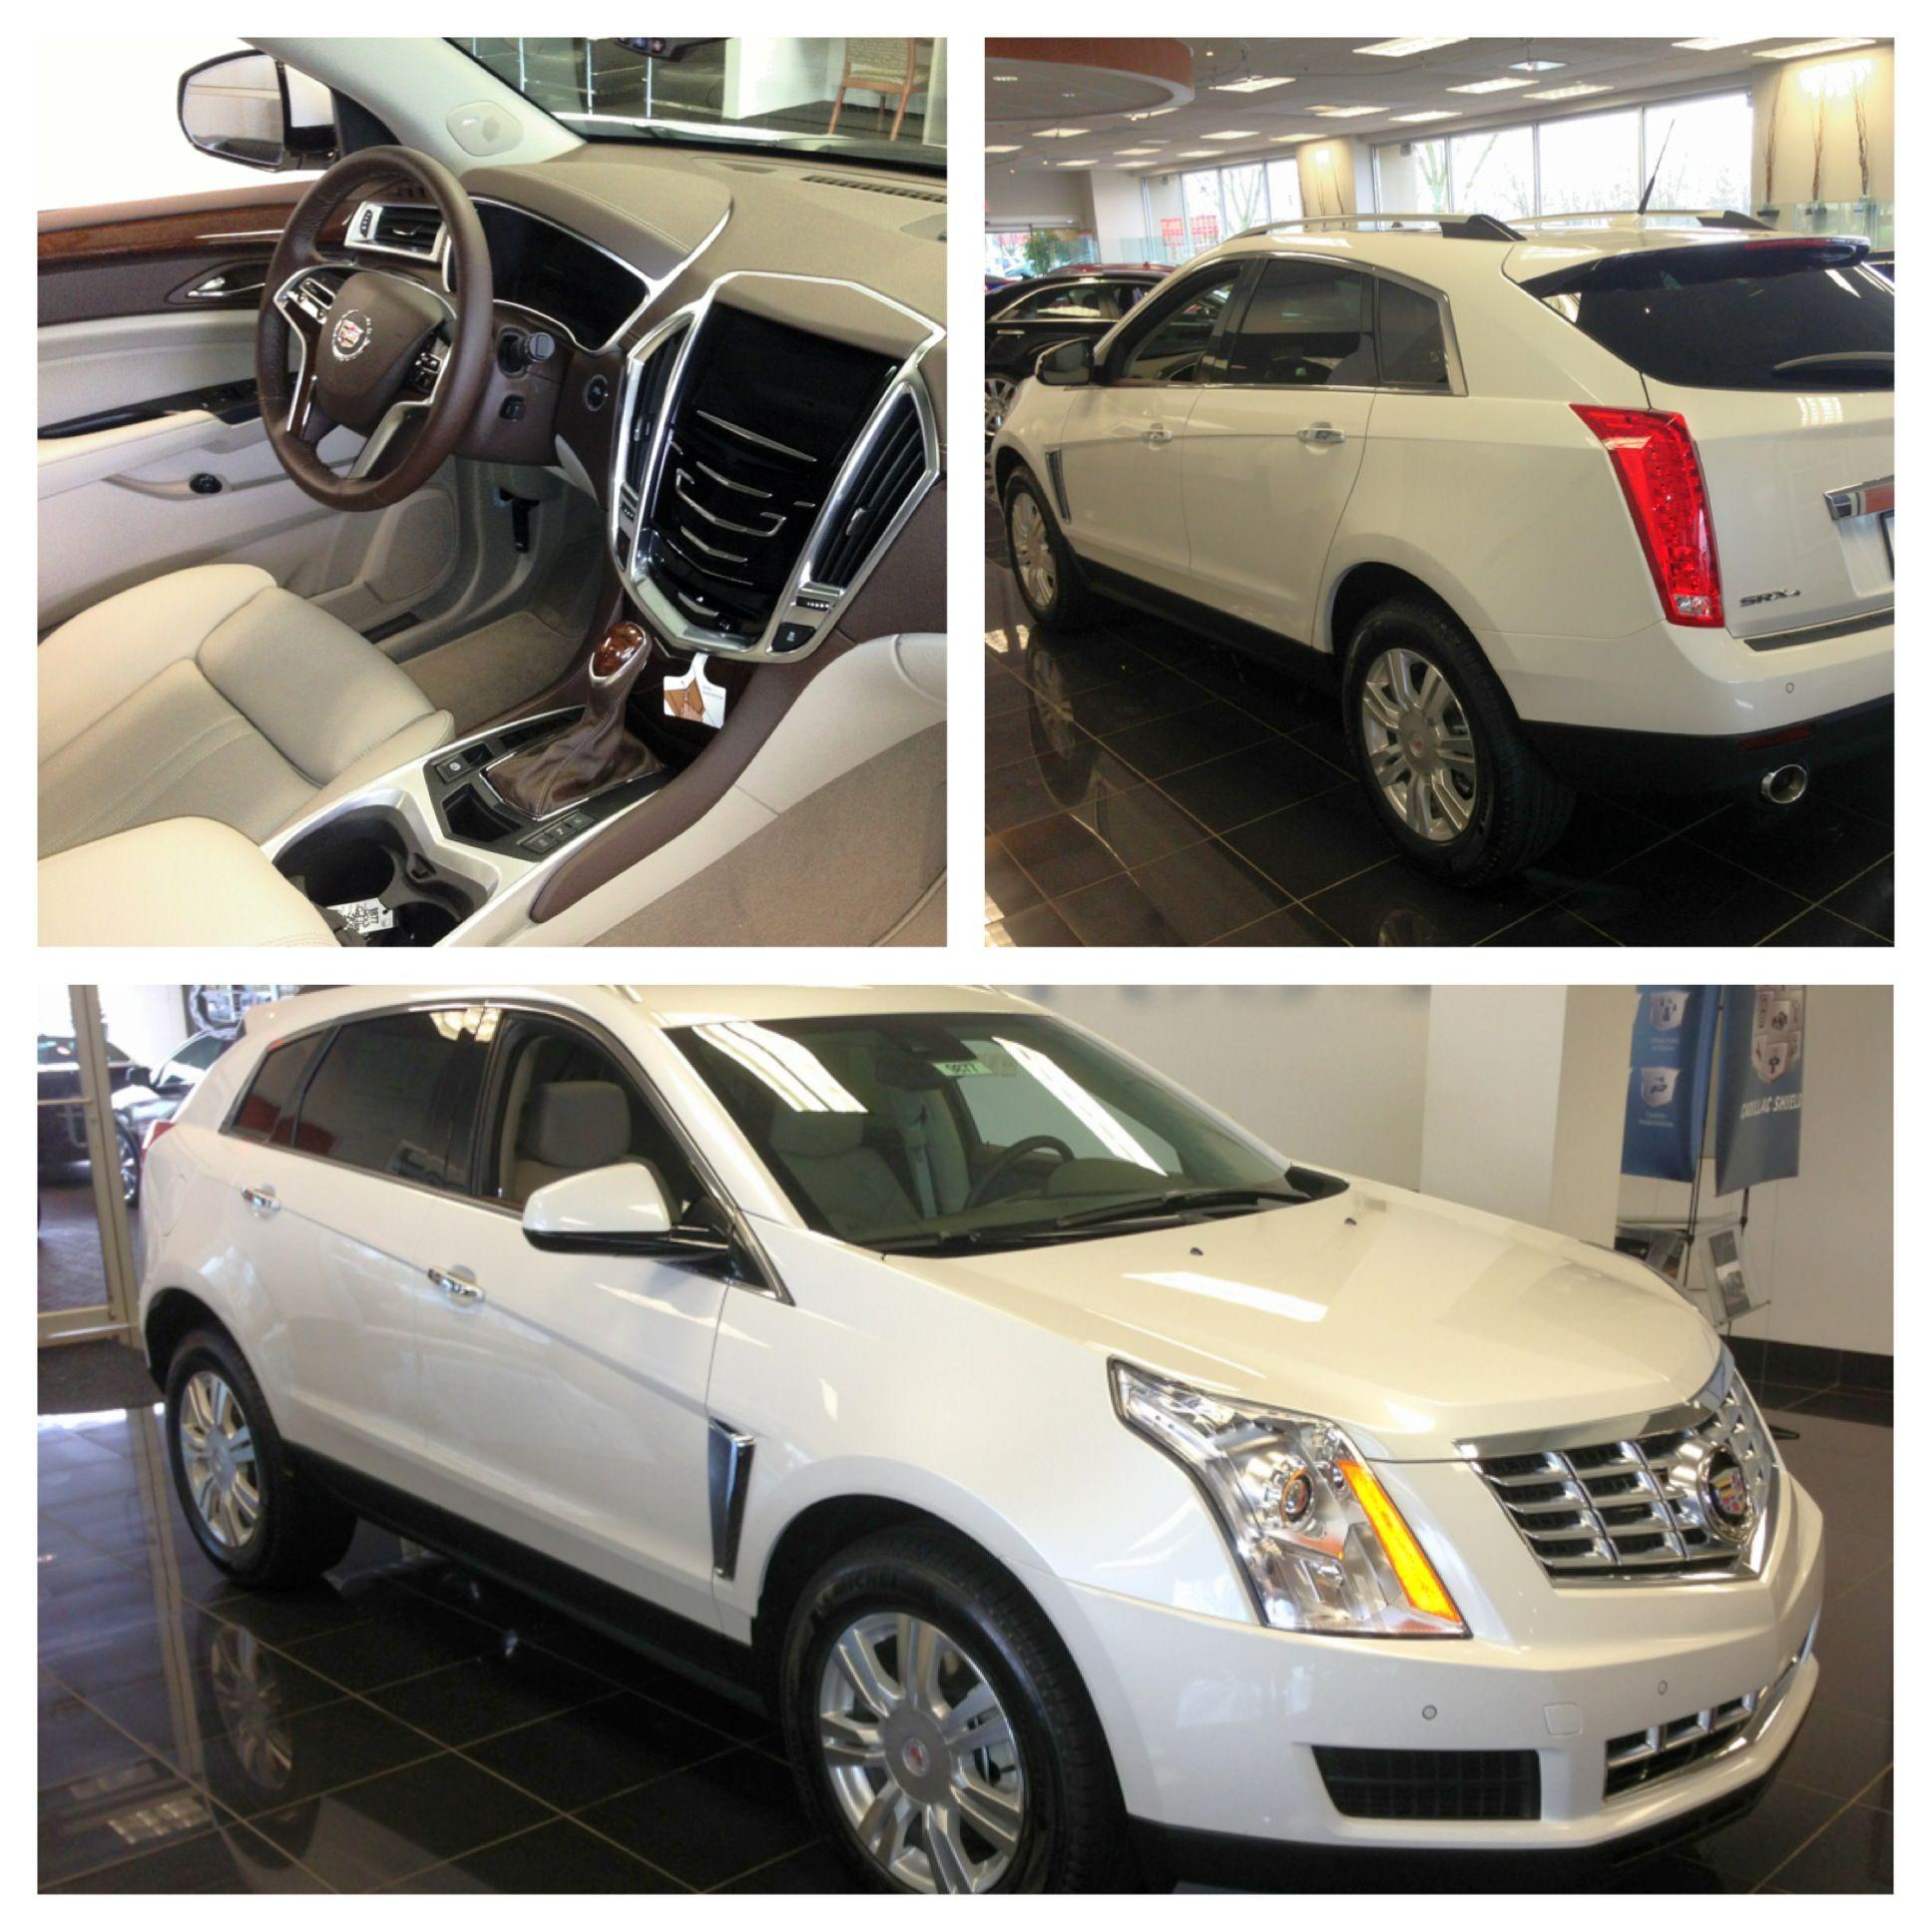 Cadillac 2013 Srx: 2013 Cadillac SRX - My Dream Vehicle...